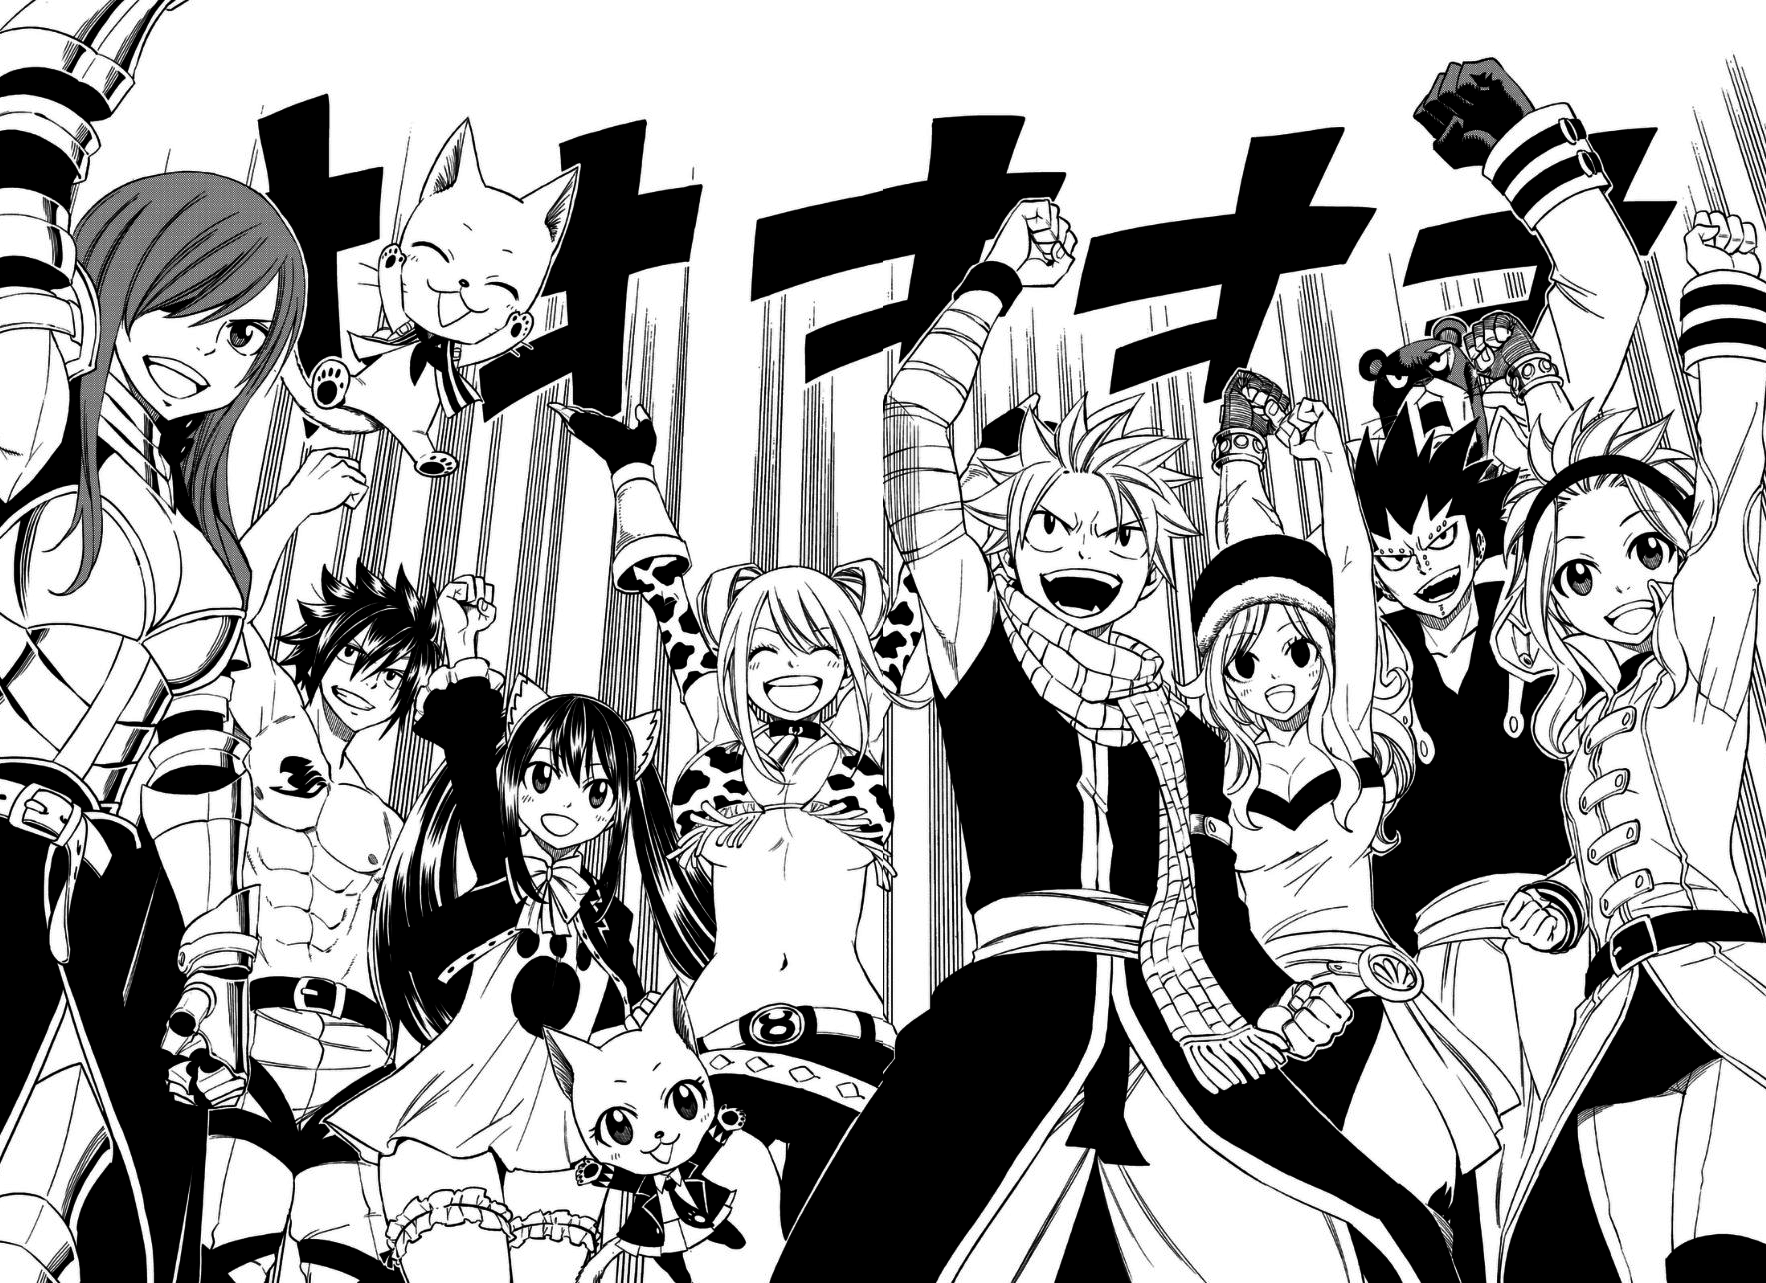 Gajil redfox histoire x792 fairy tail wiki fandom - Image manga fairy tail ...